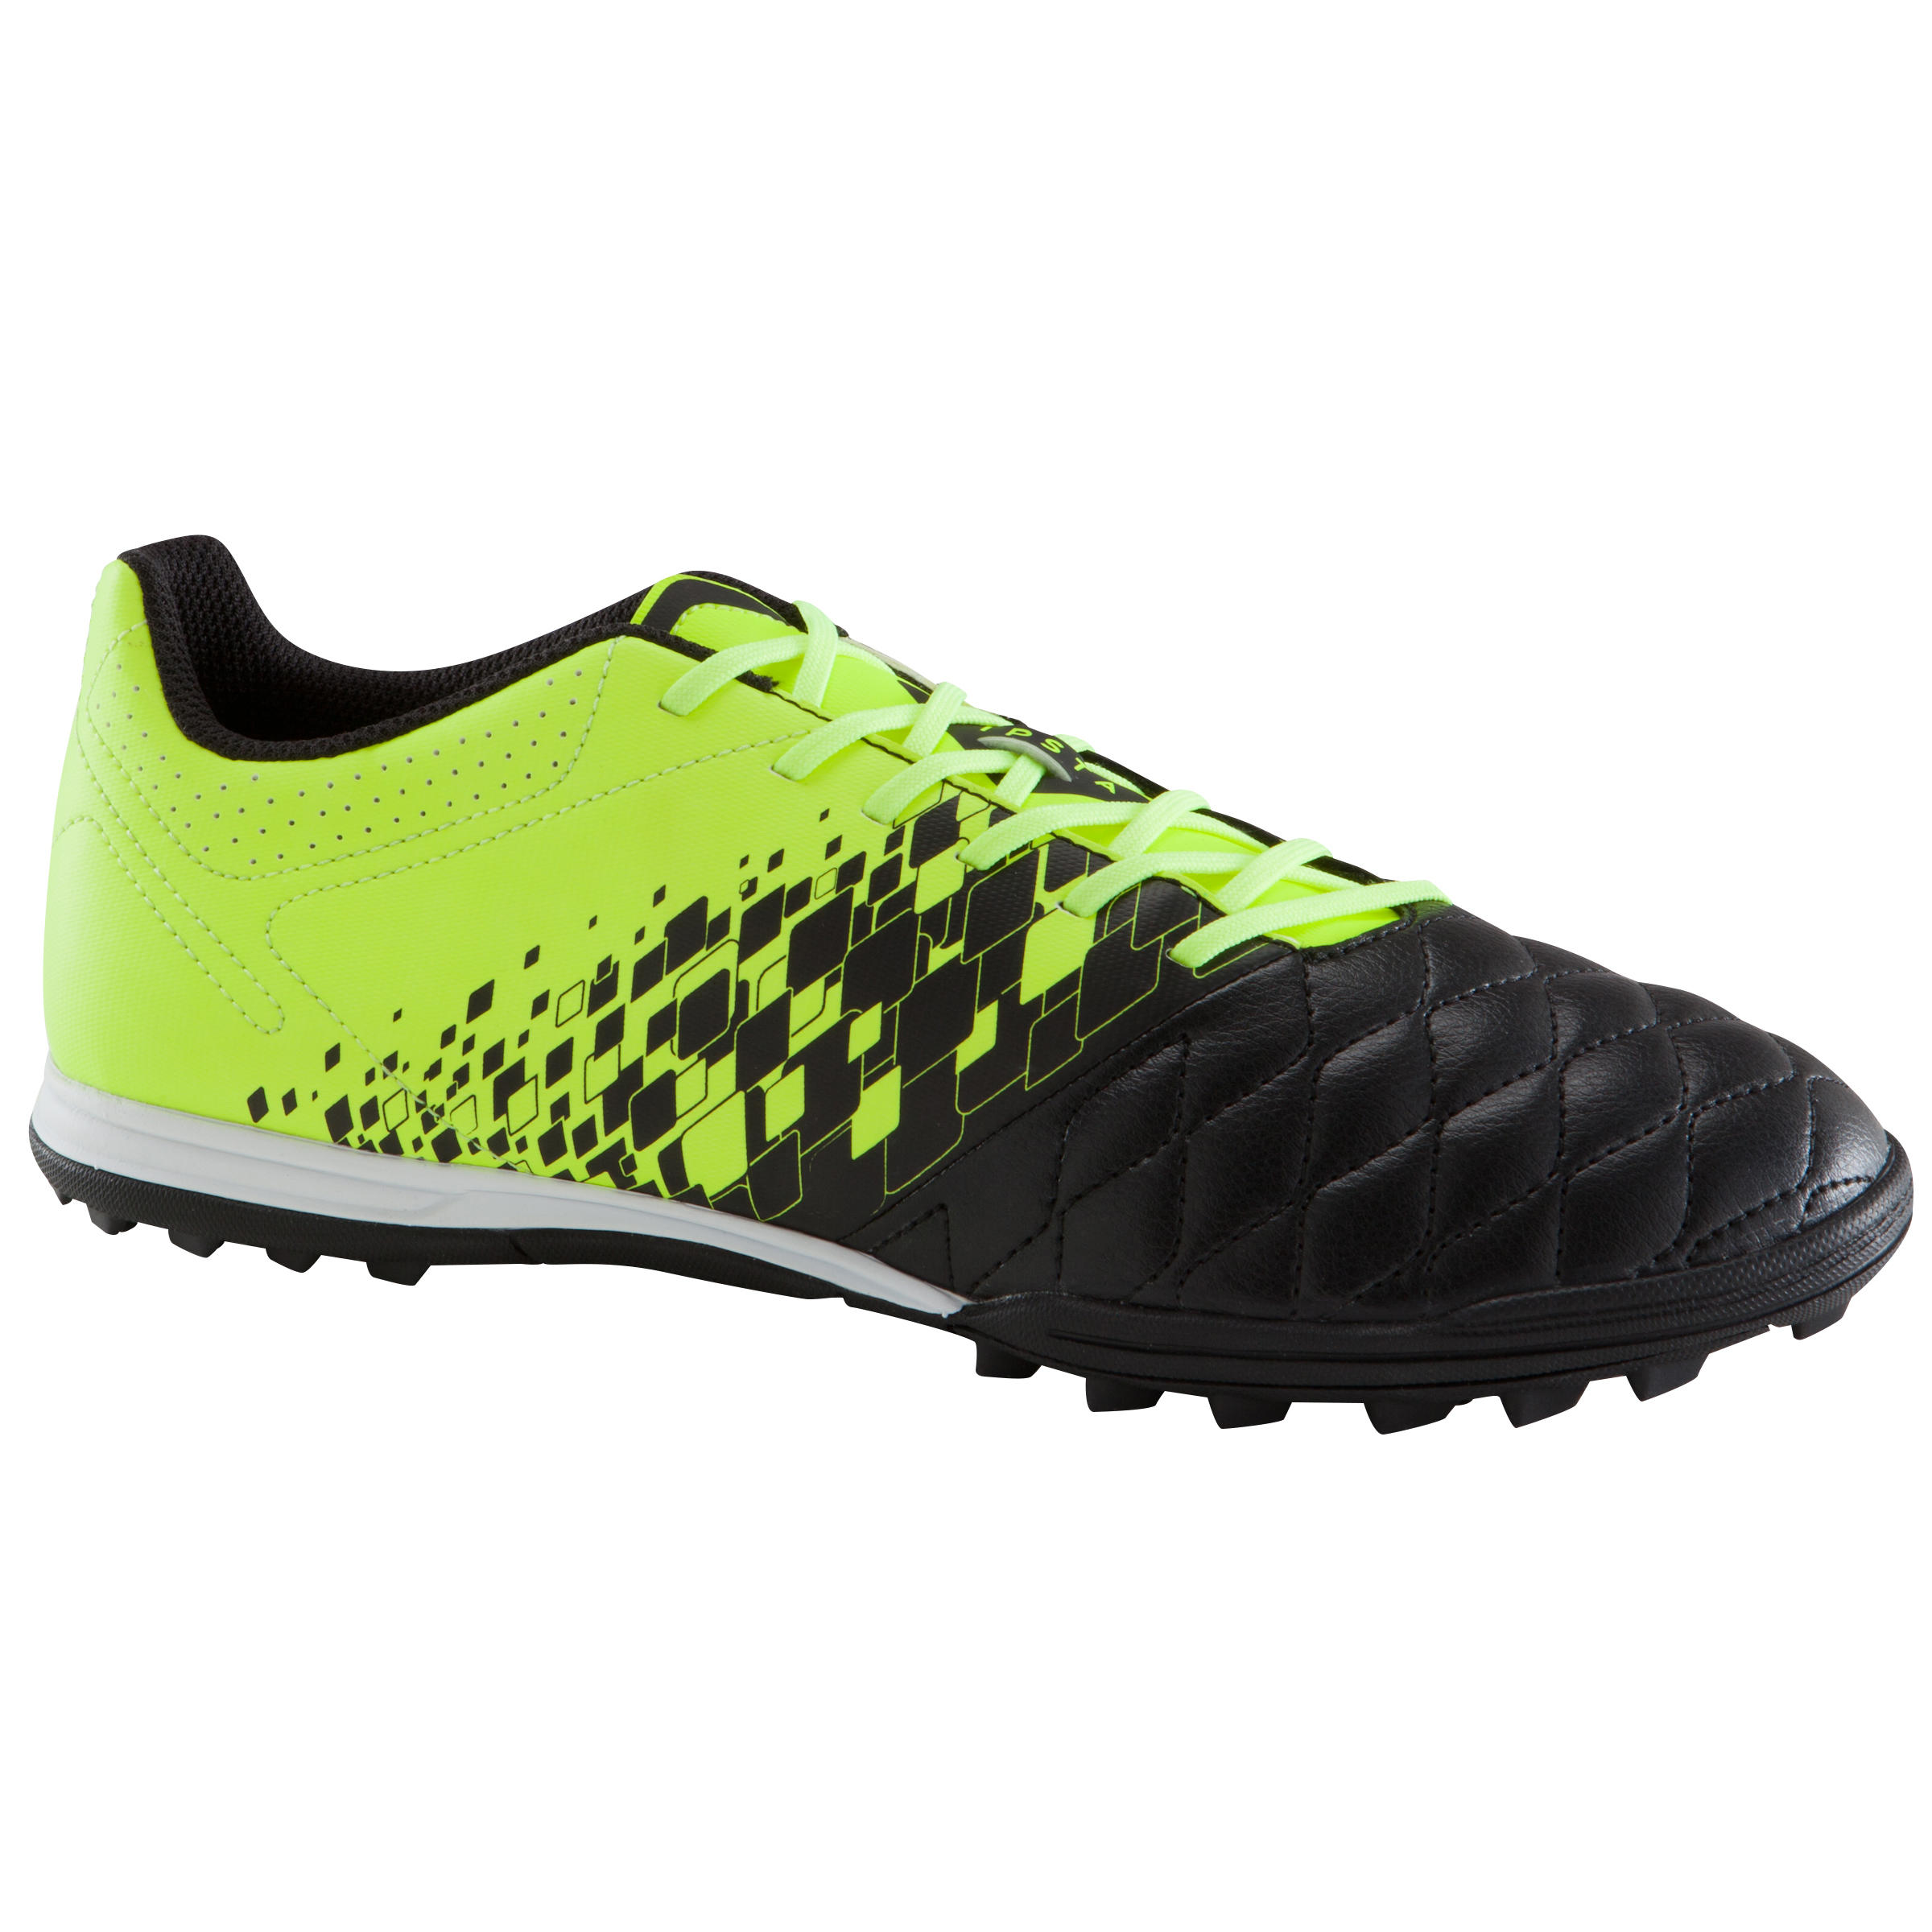 Chaussure De Soccer Adulte...